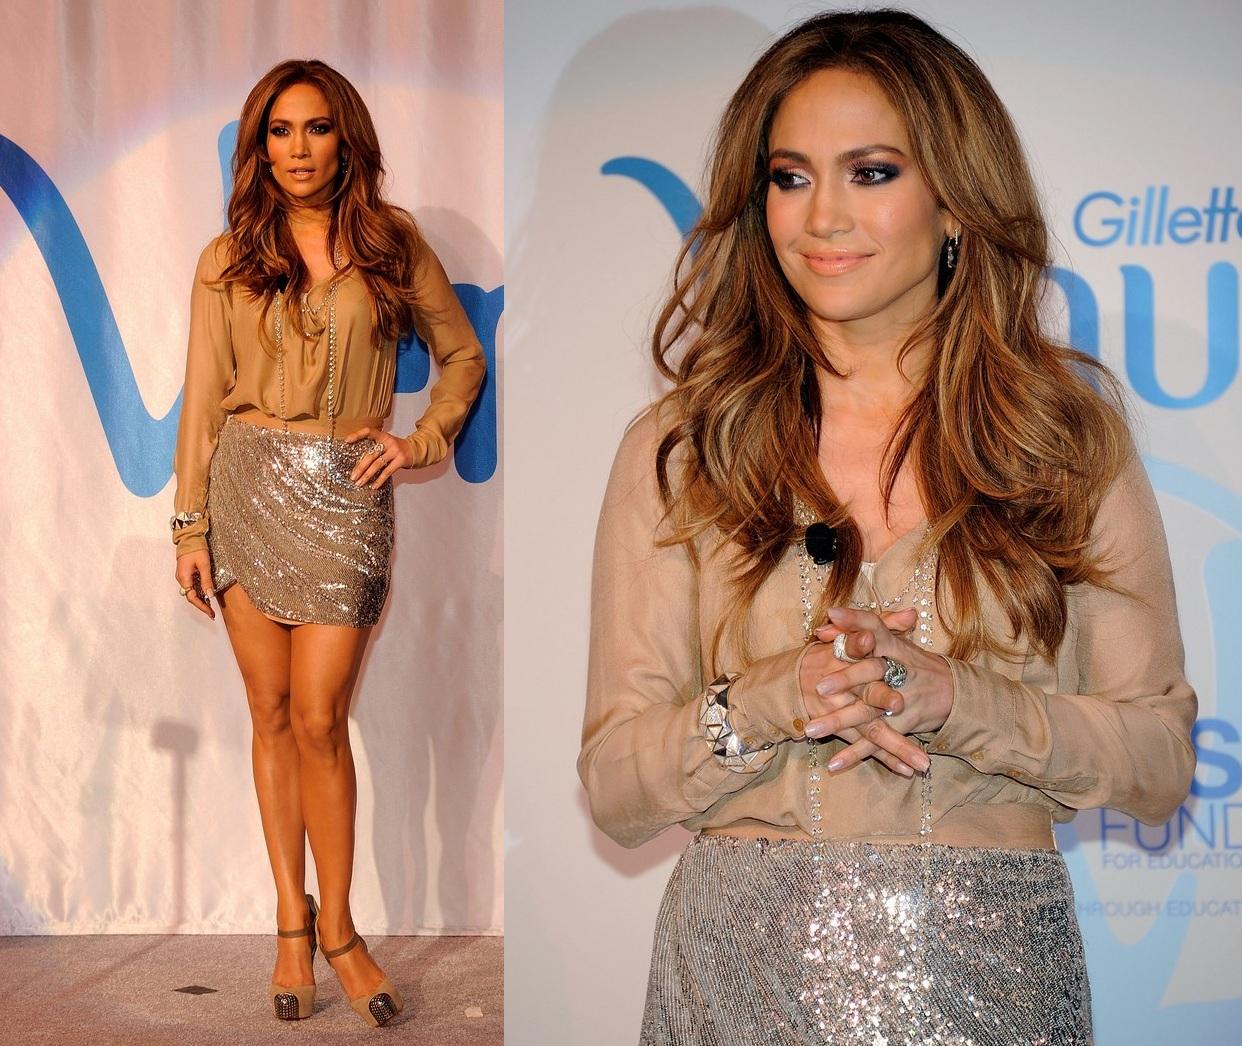 http://2.bp.blogspot.com/_wstTDai4HKA/TUovfUkn5JI/AAAAAAAAFgM/hOU6zWiSrY8/s1600/Jennifer+Lopez+Nude+Top+%2526++Sequin+Skirt.jpg